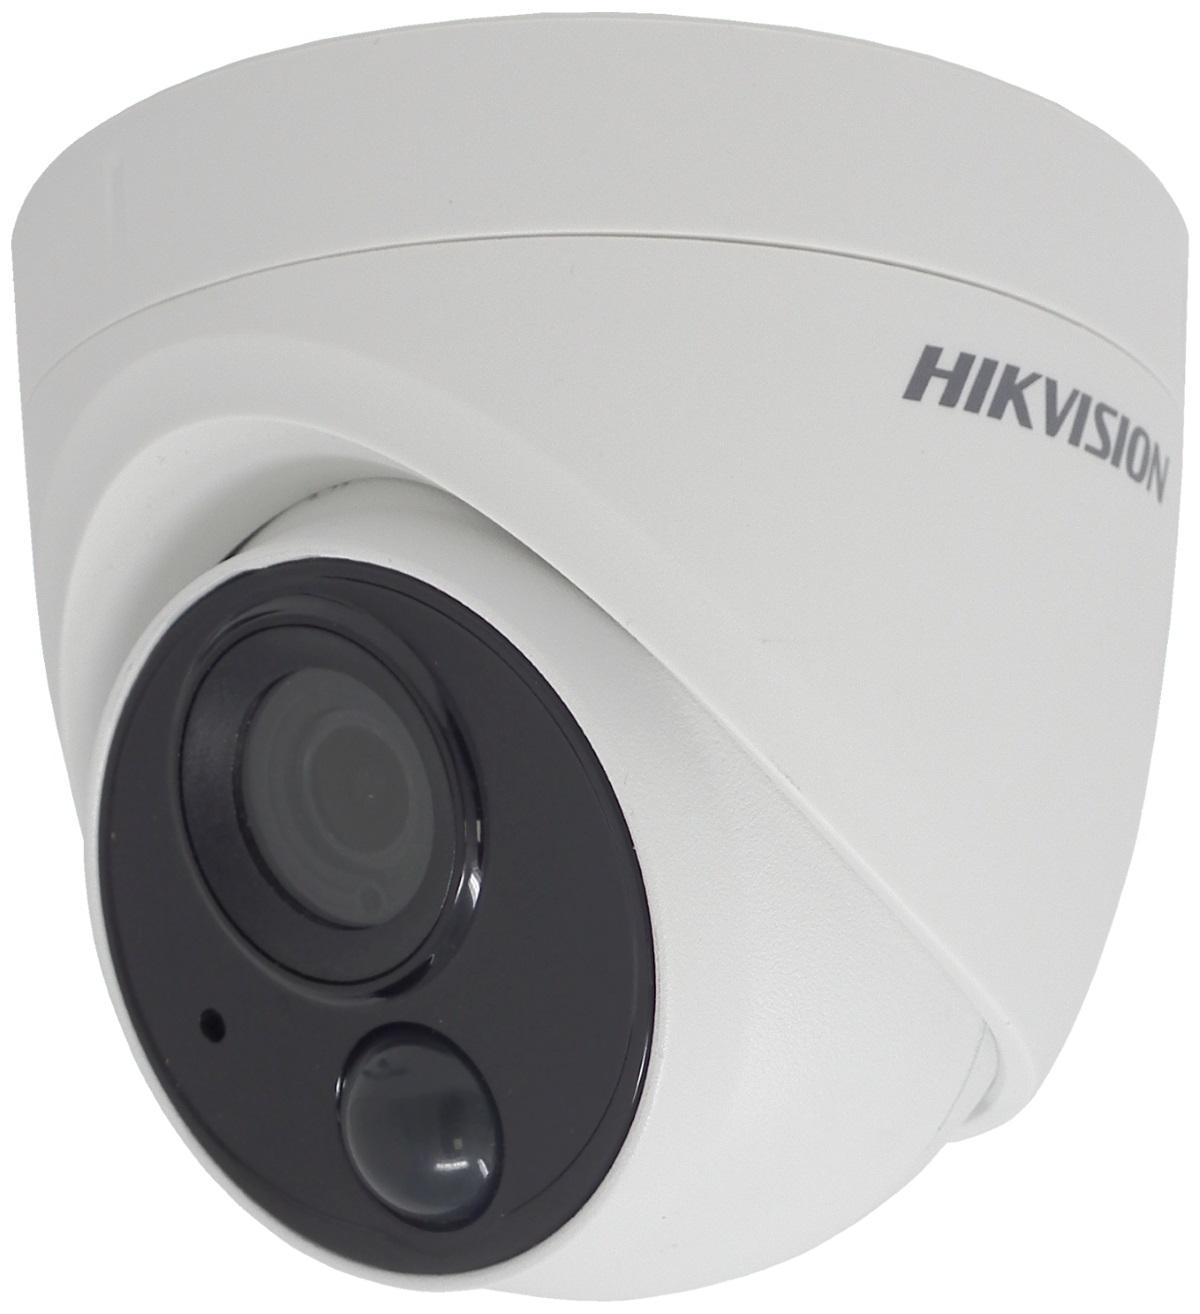 HIKVISION - DS-2CE71D8T-PIRLO